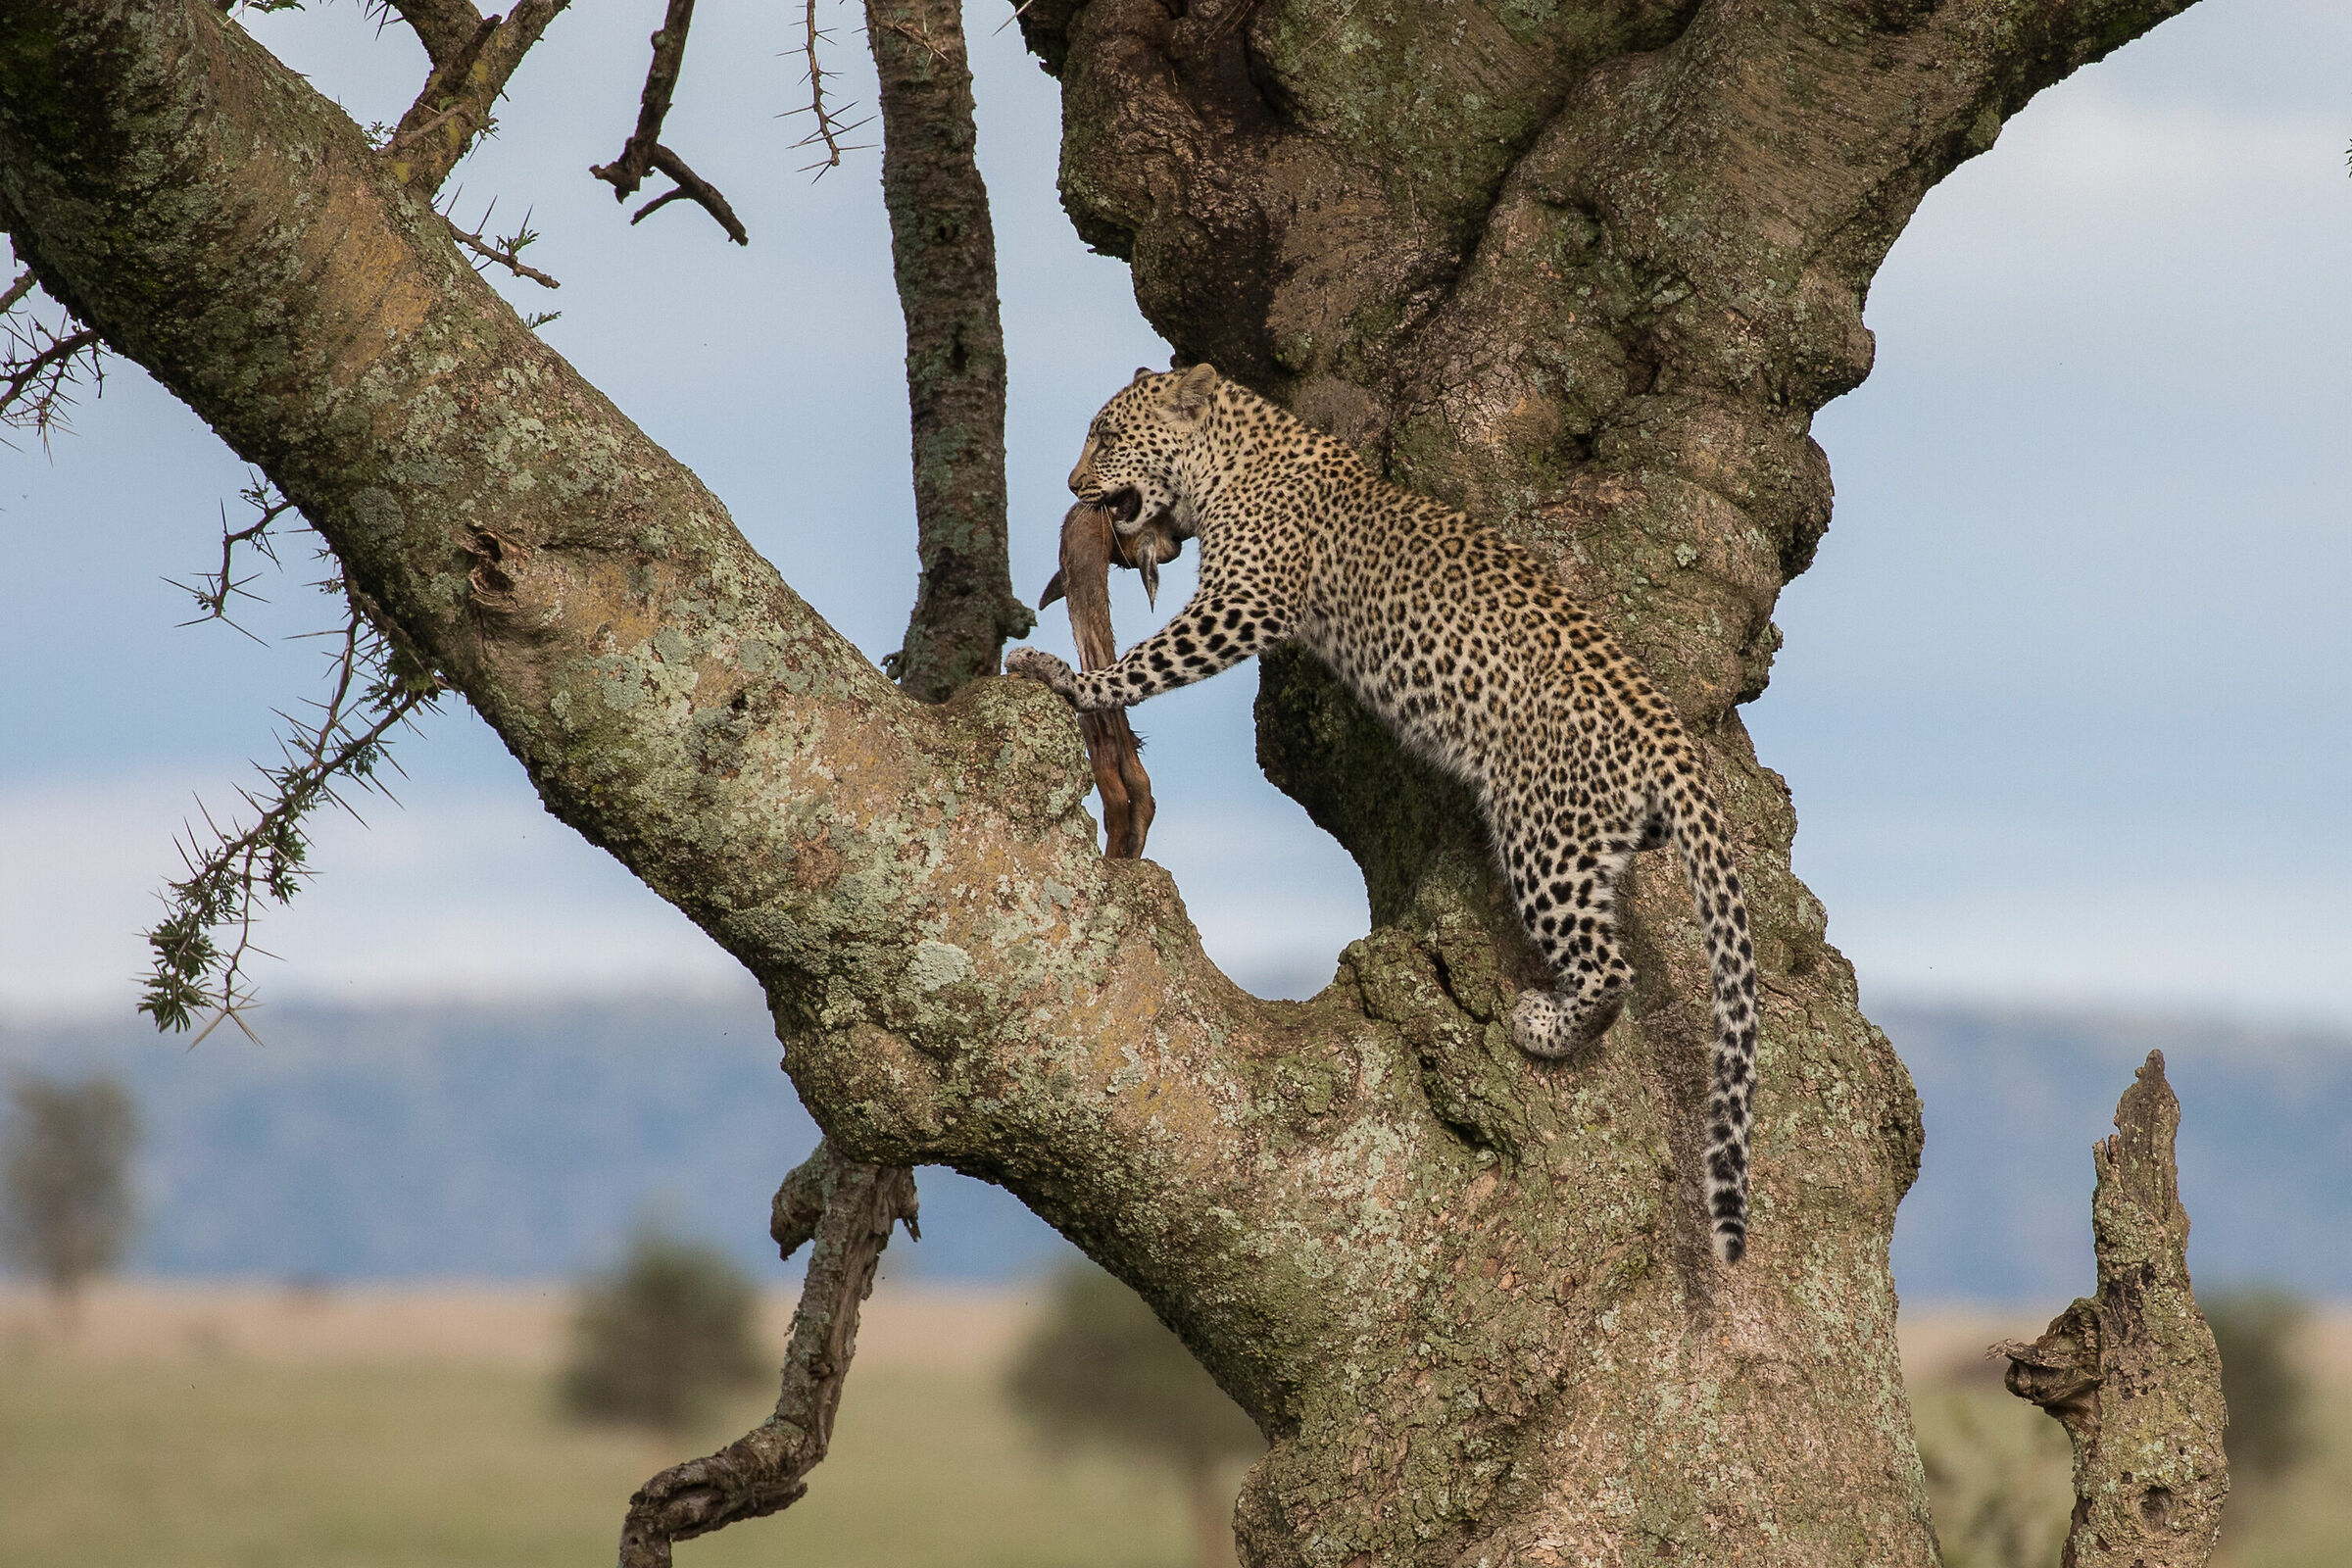 Take-away leopard style...